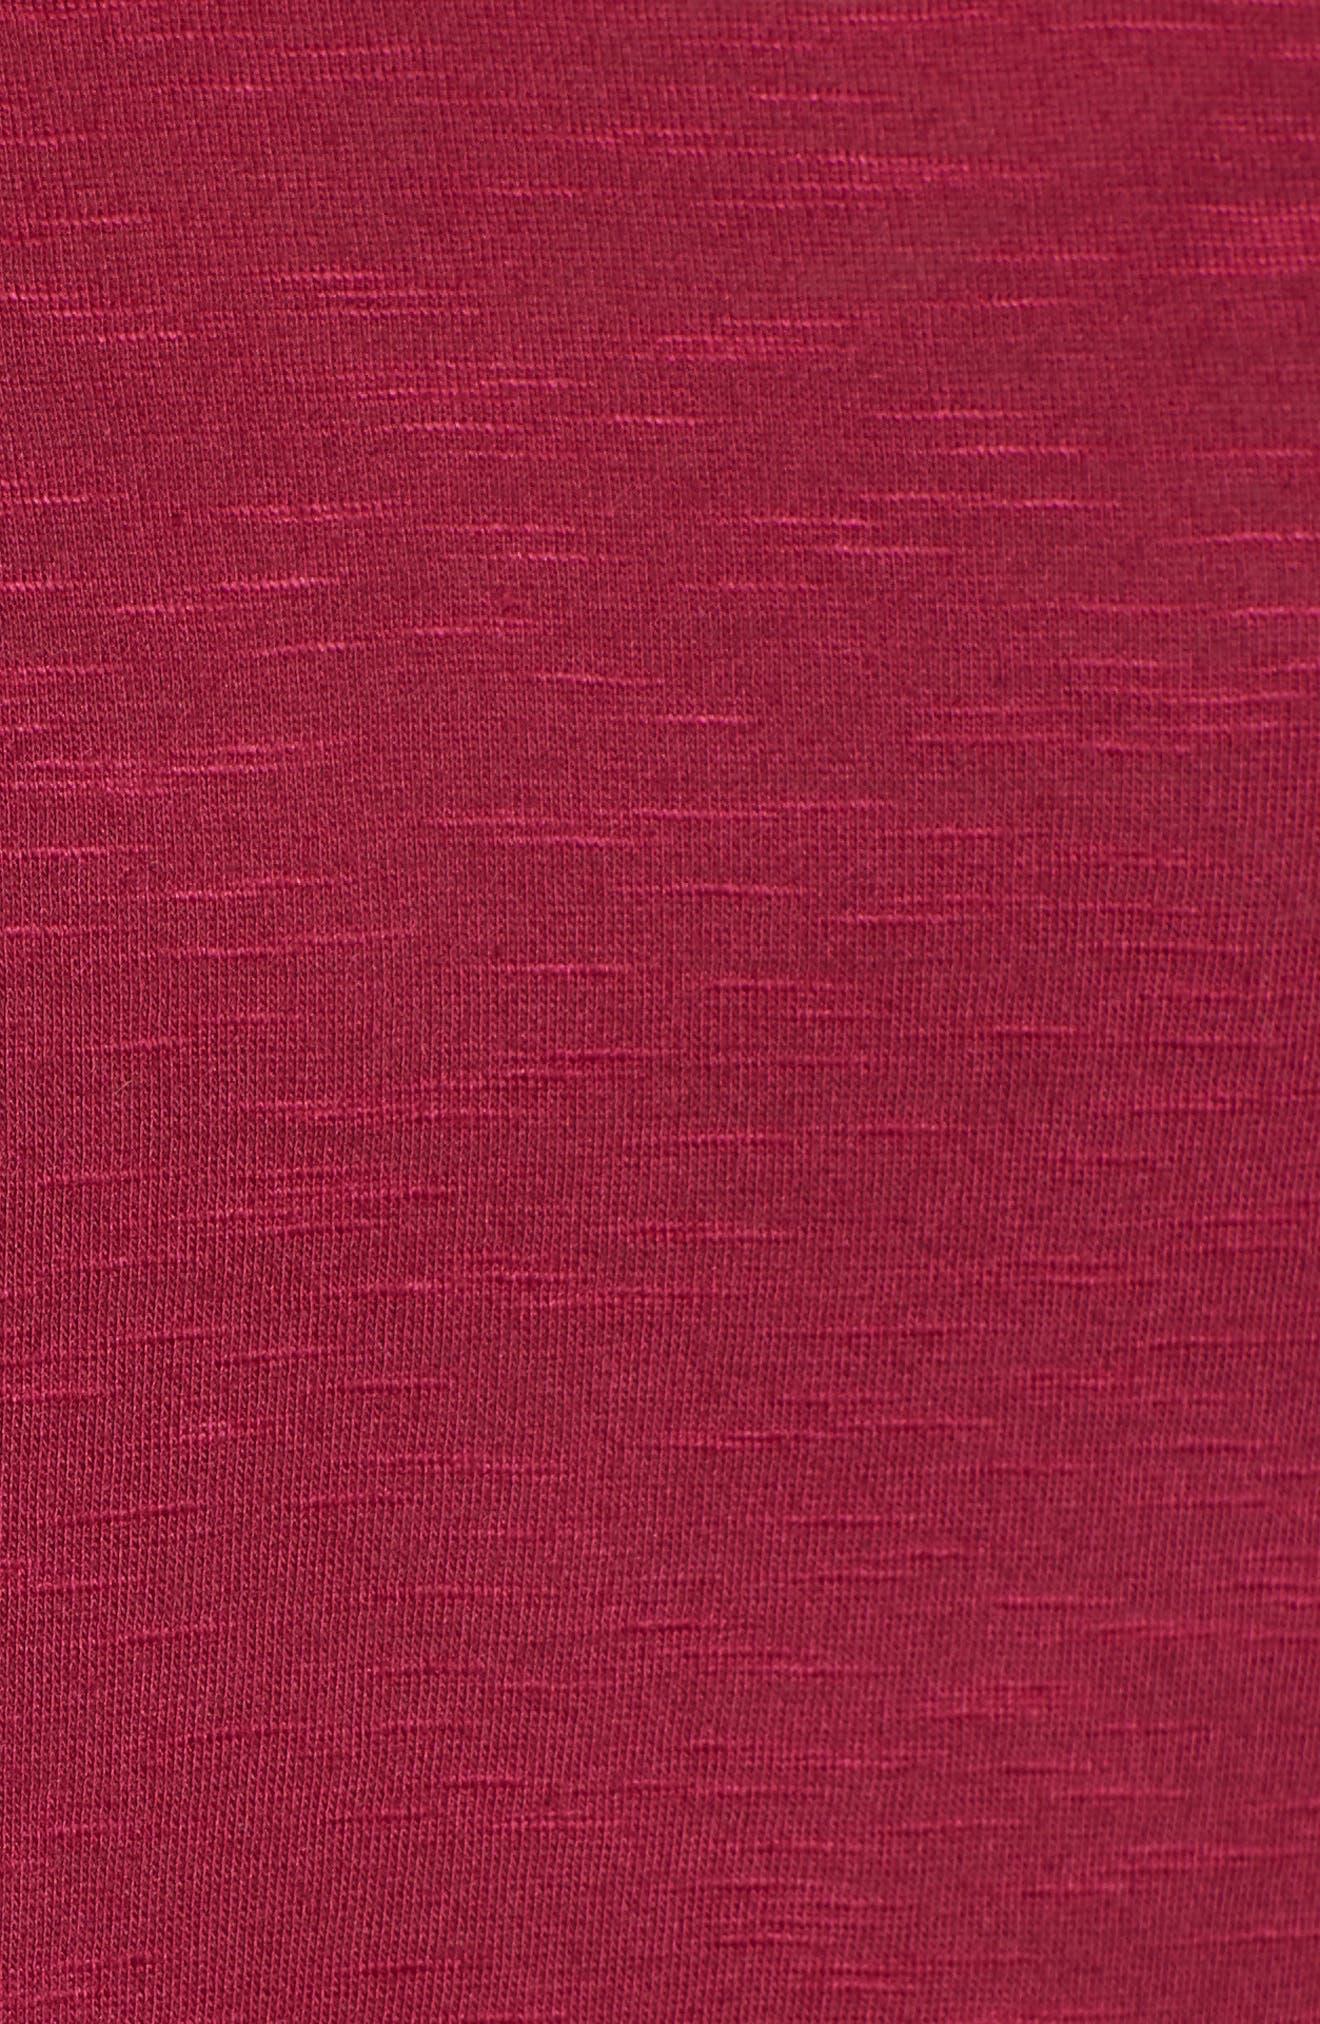 Relaxed Peplum Tee,                             Alternate thumbnail 6, color,                             Purple Fuchsia